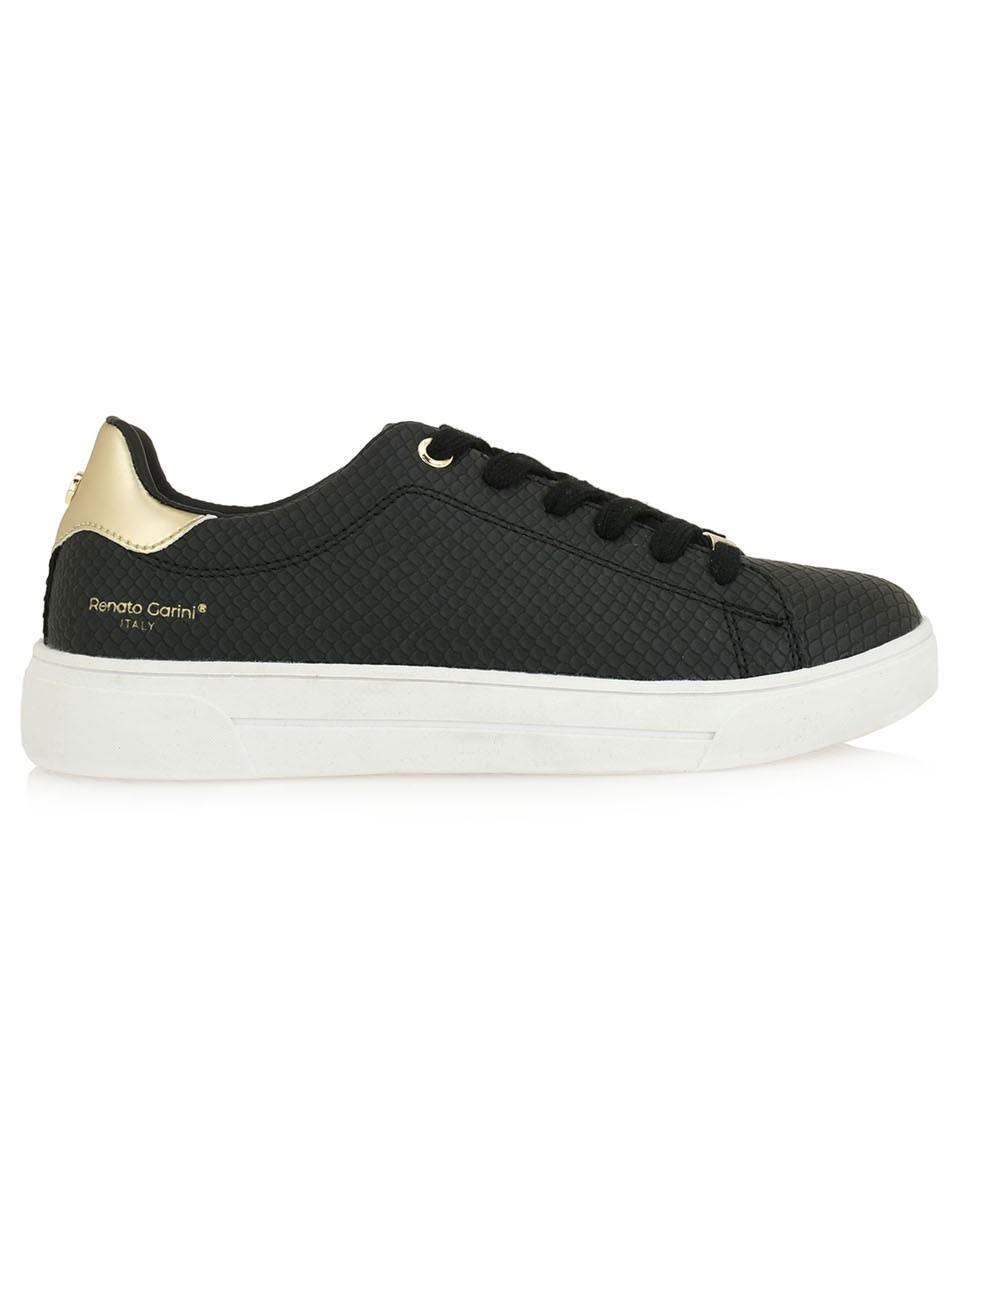 Renato Garini Γυναικεία Παπούτσια Sneakers 203-57Q Mαύρο Φίδι